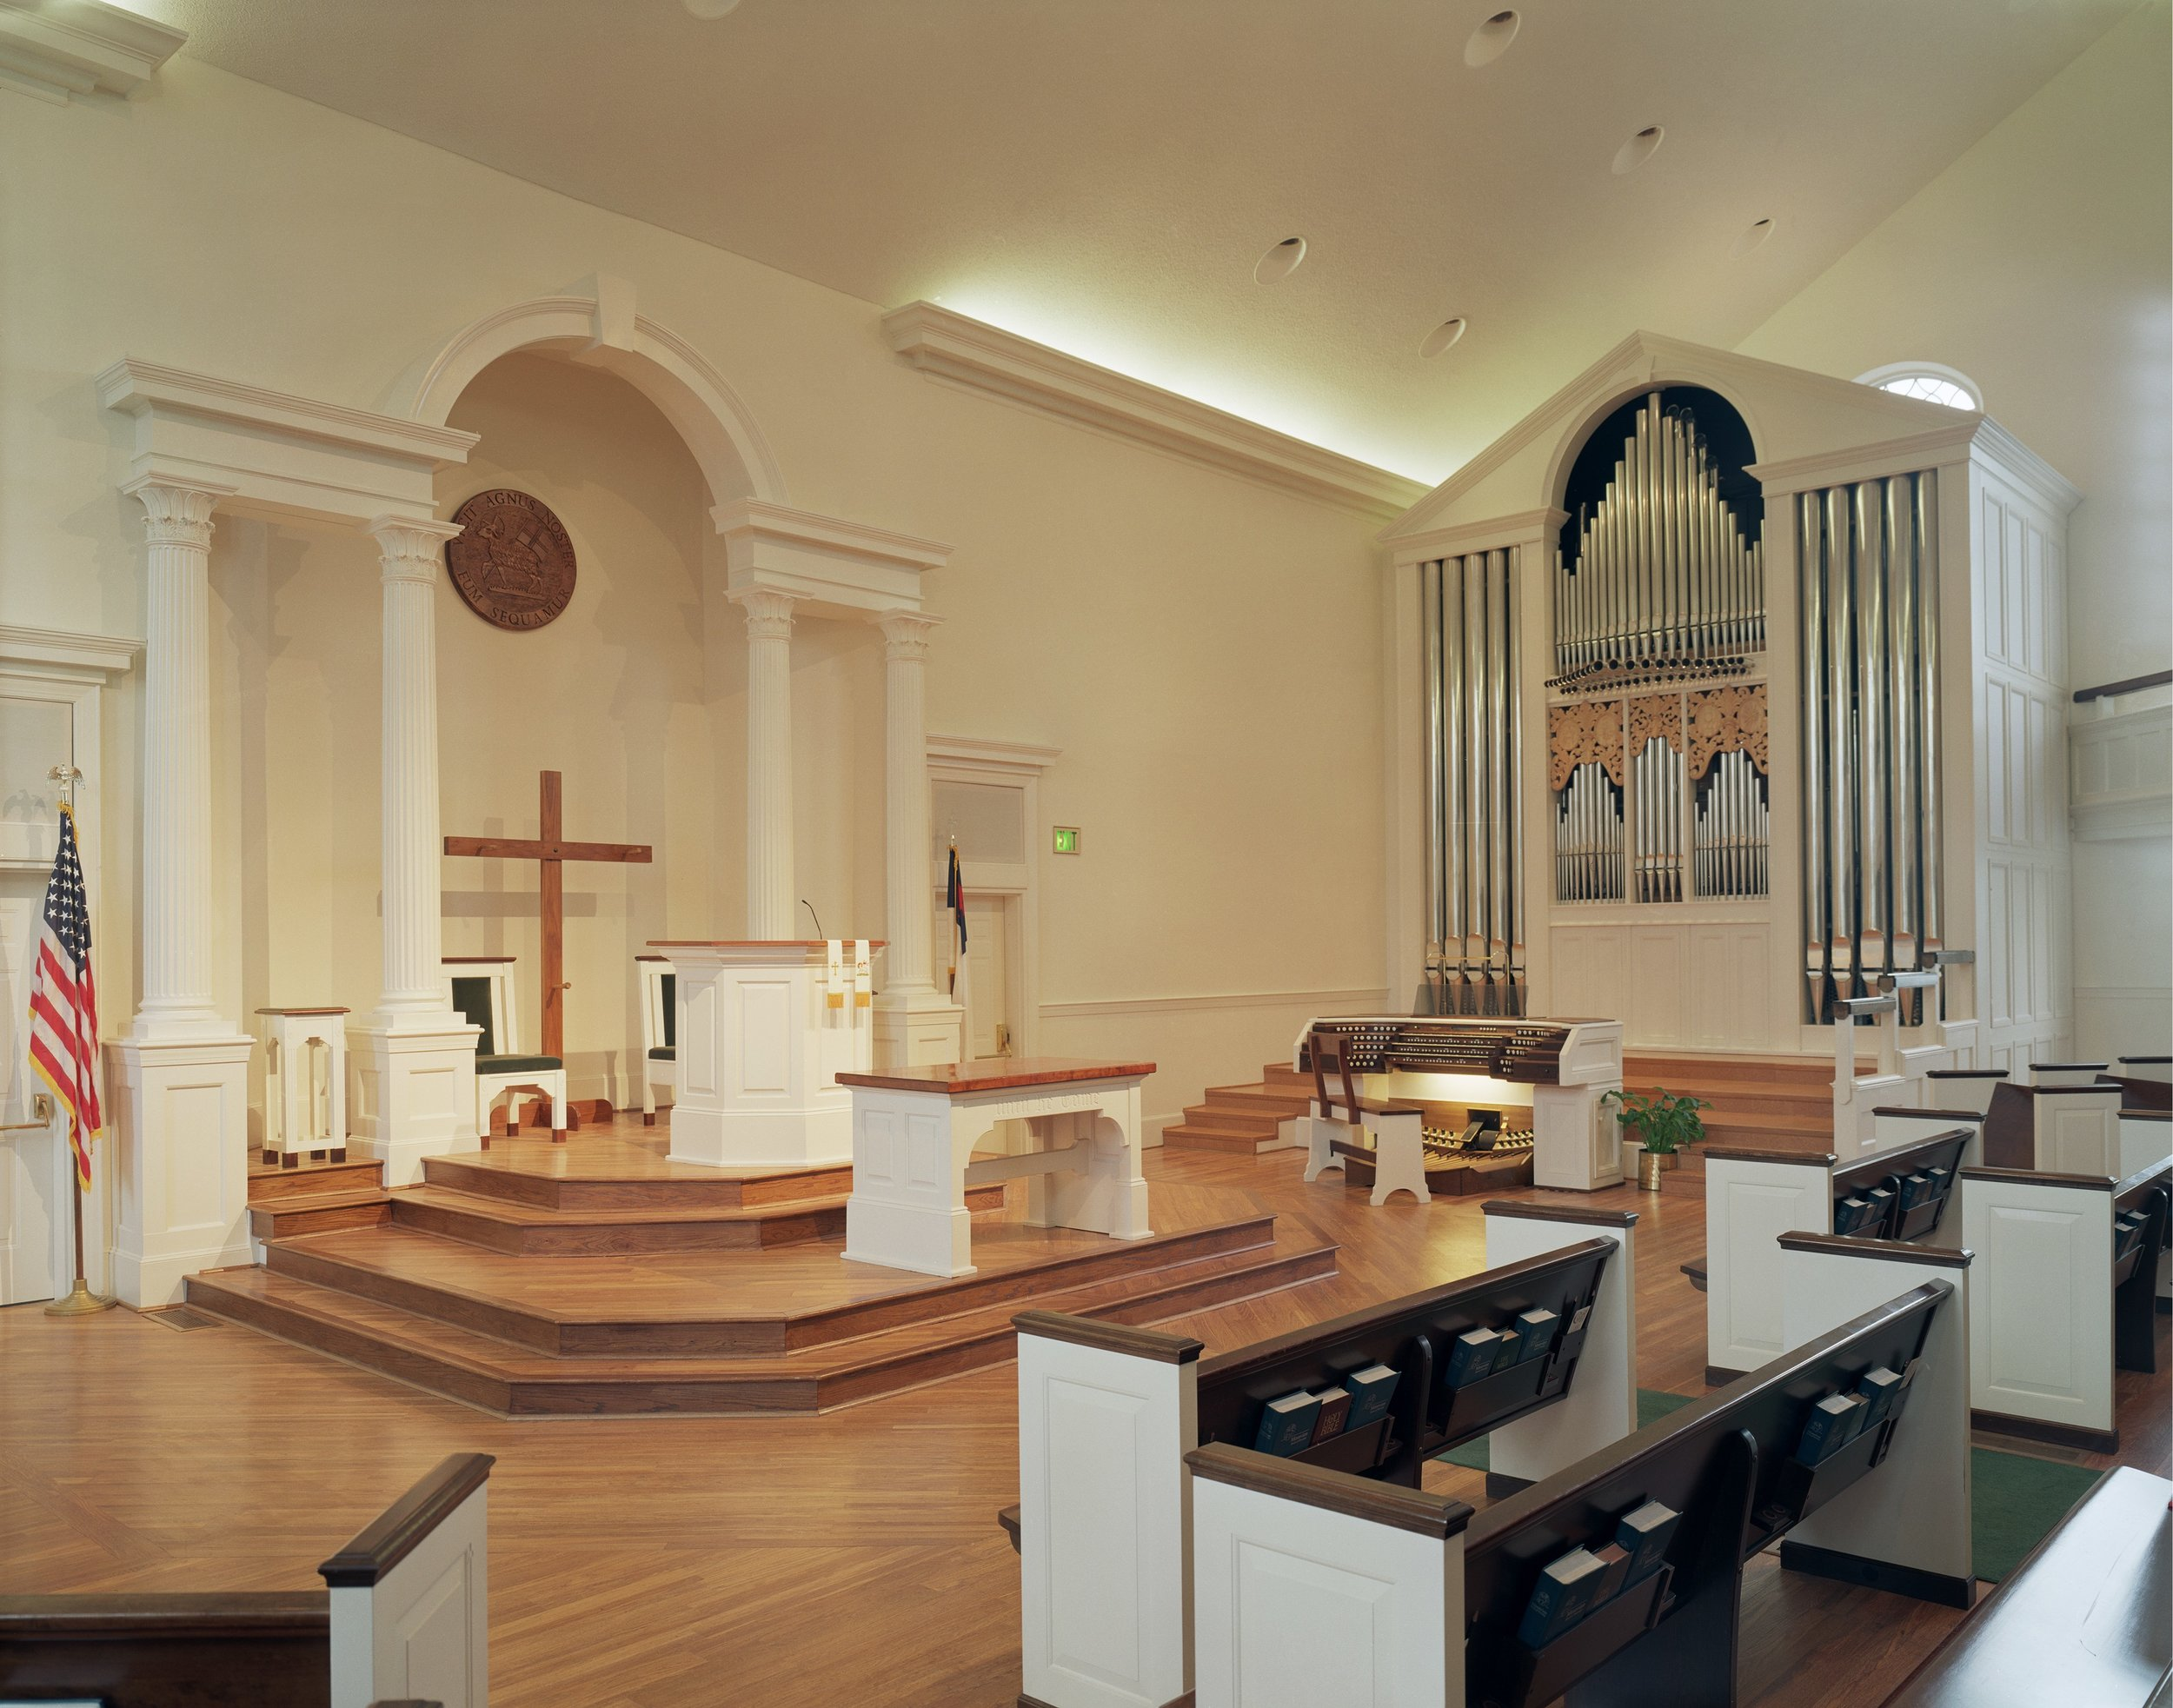 Kernersville Moravian Church -Kernersville, NC